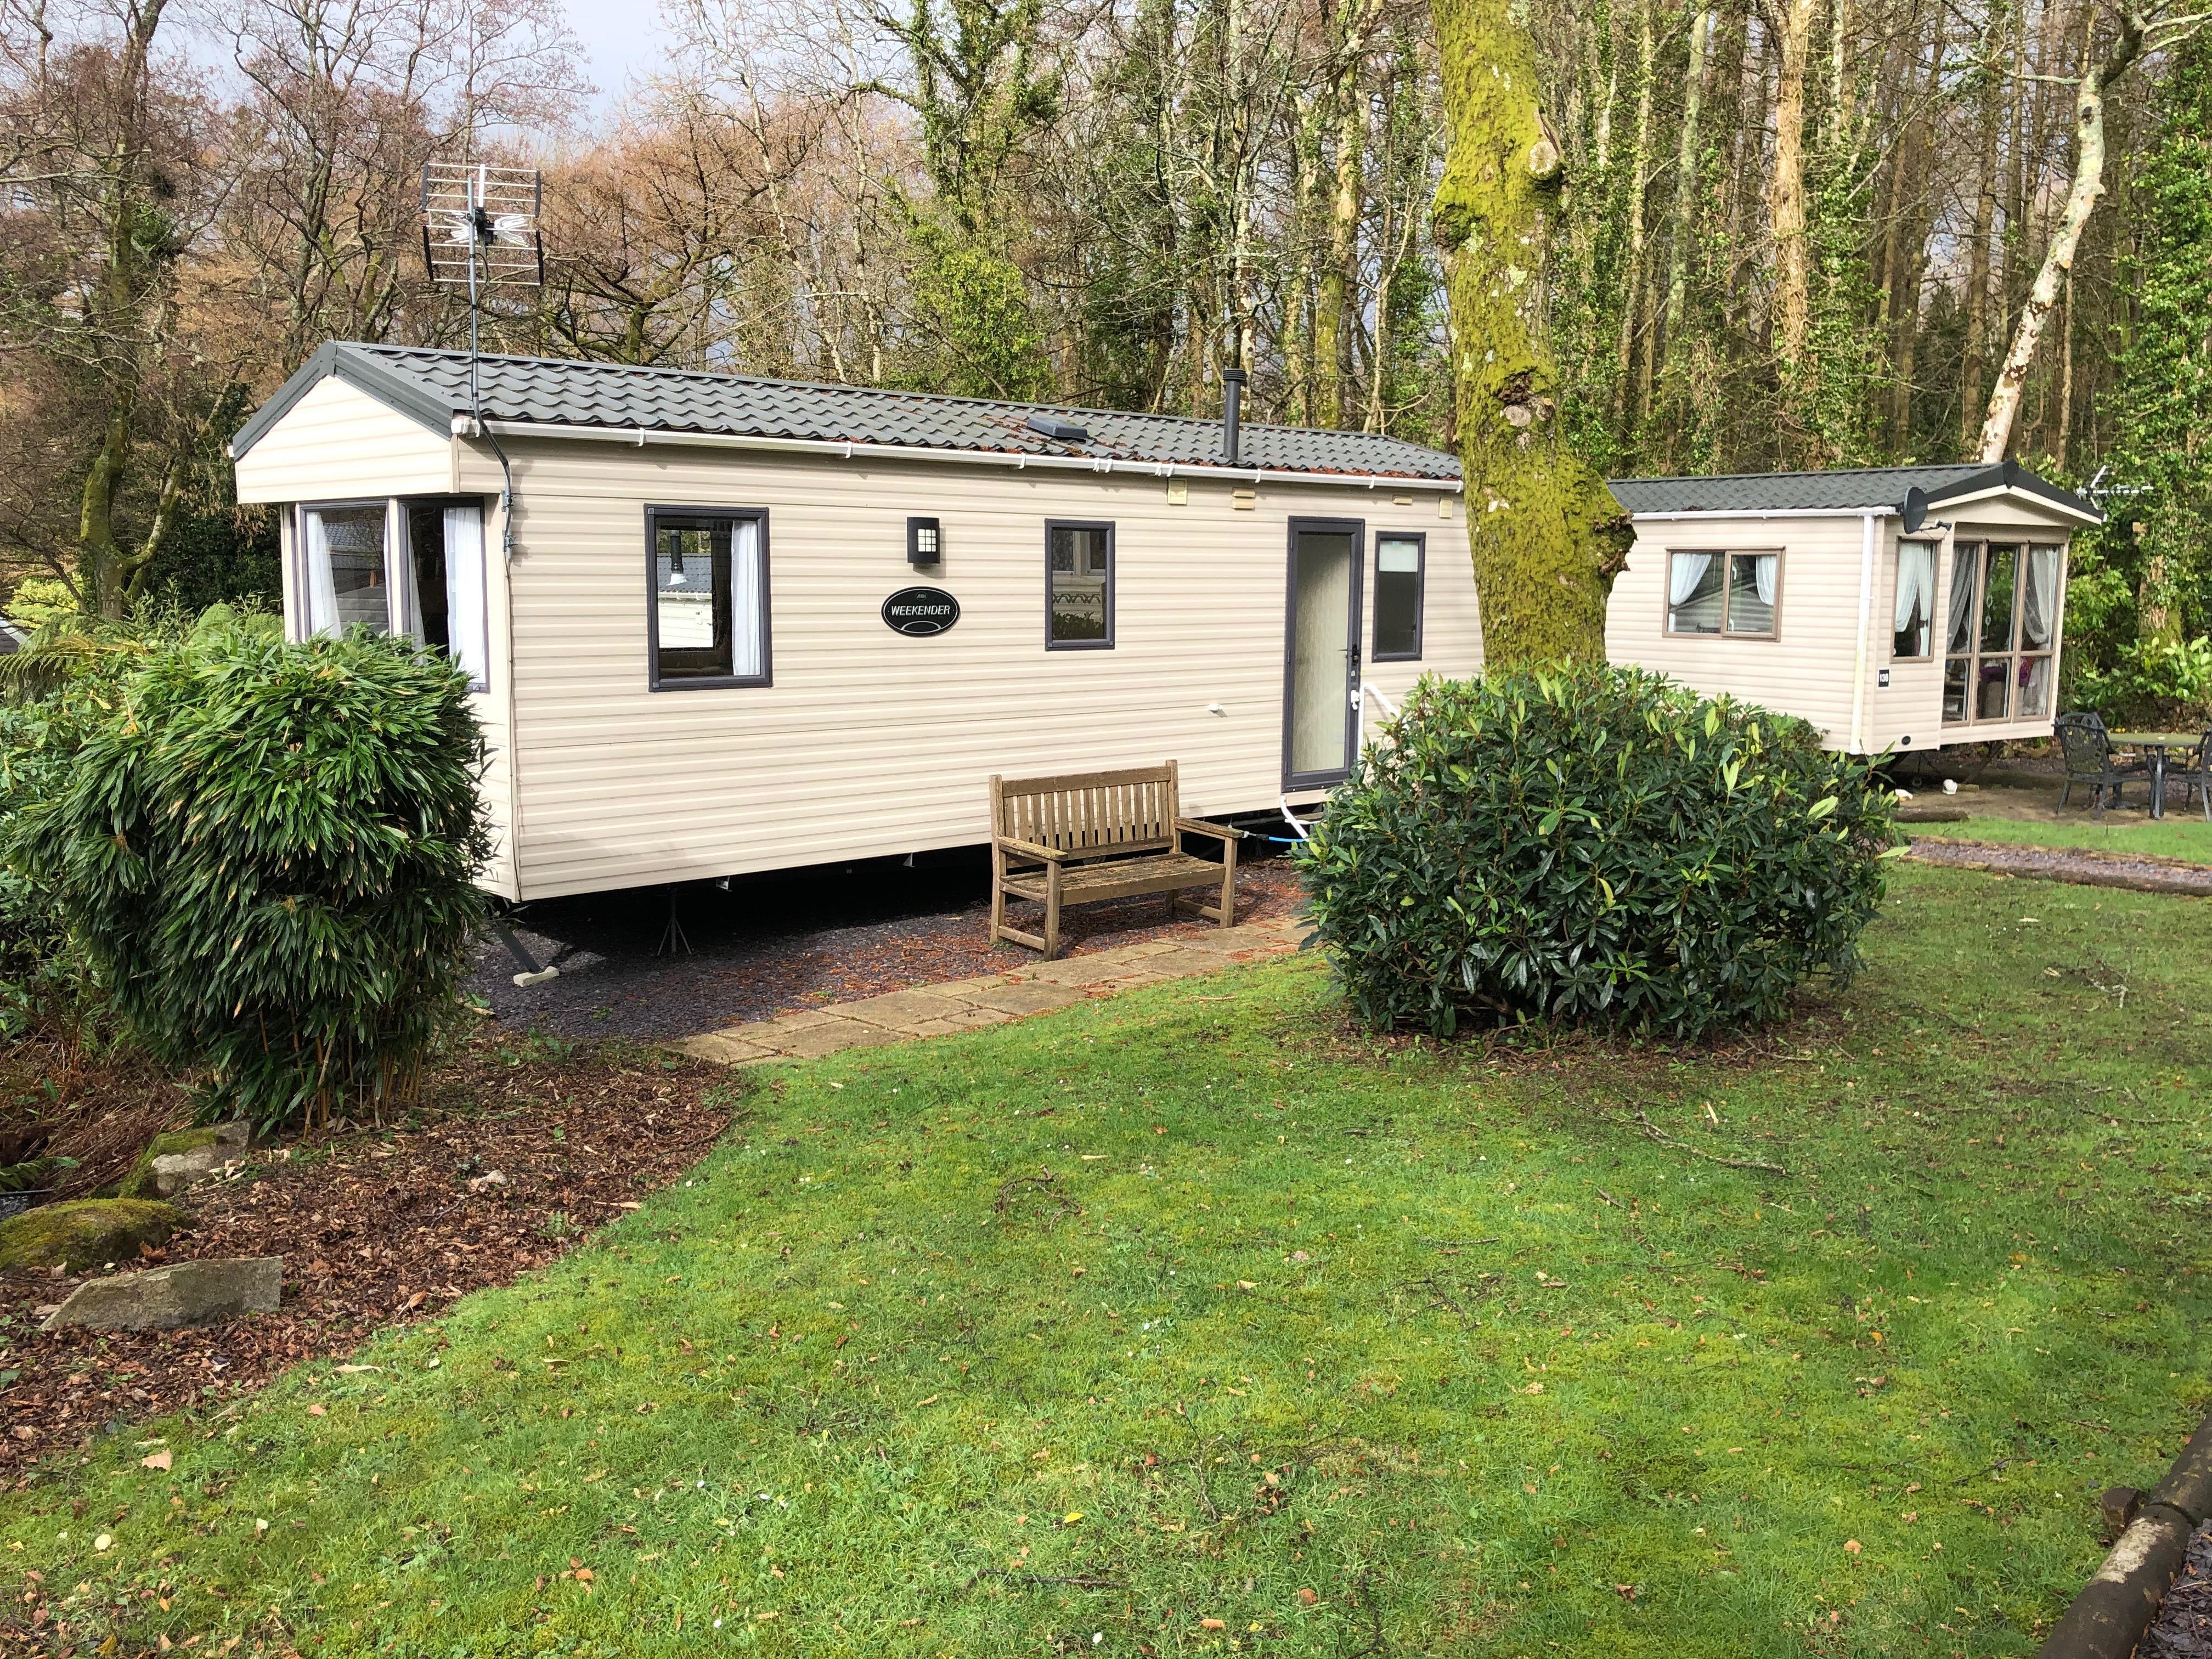 Cheap static caravan for sale North Wales in Caernarfon   Expired ...